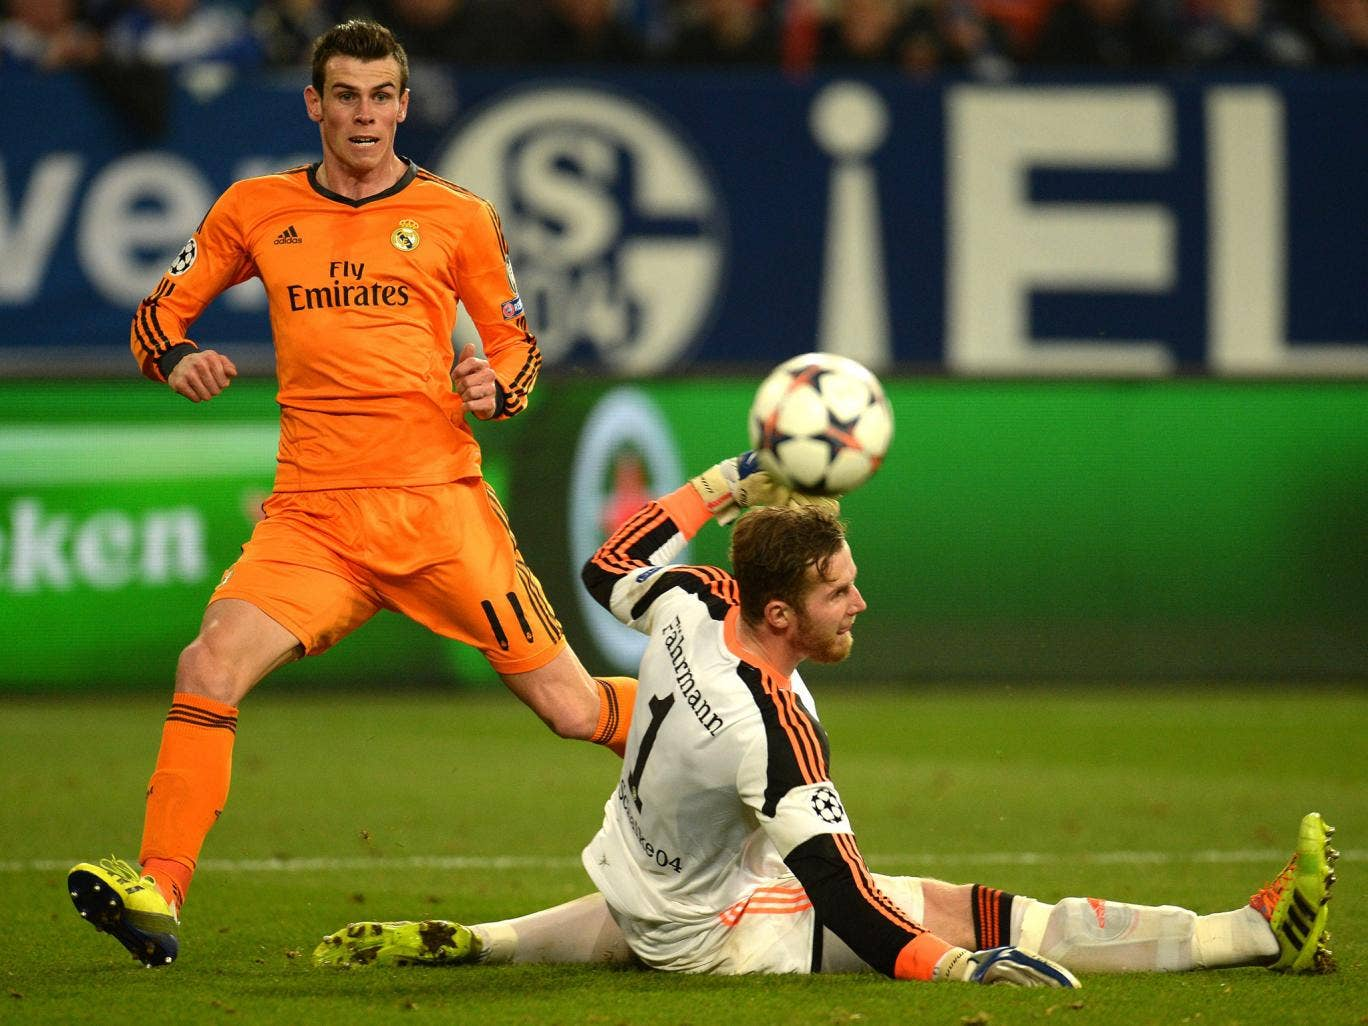 Real Madrid's Welsh striker Gareth Bale (L) scores against Schalke's goalkeeper Ralf Faehrmann during the first-leg round of 16 UEFA Champions League football match